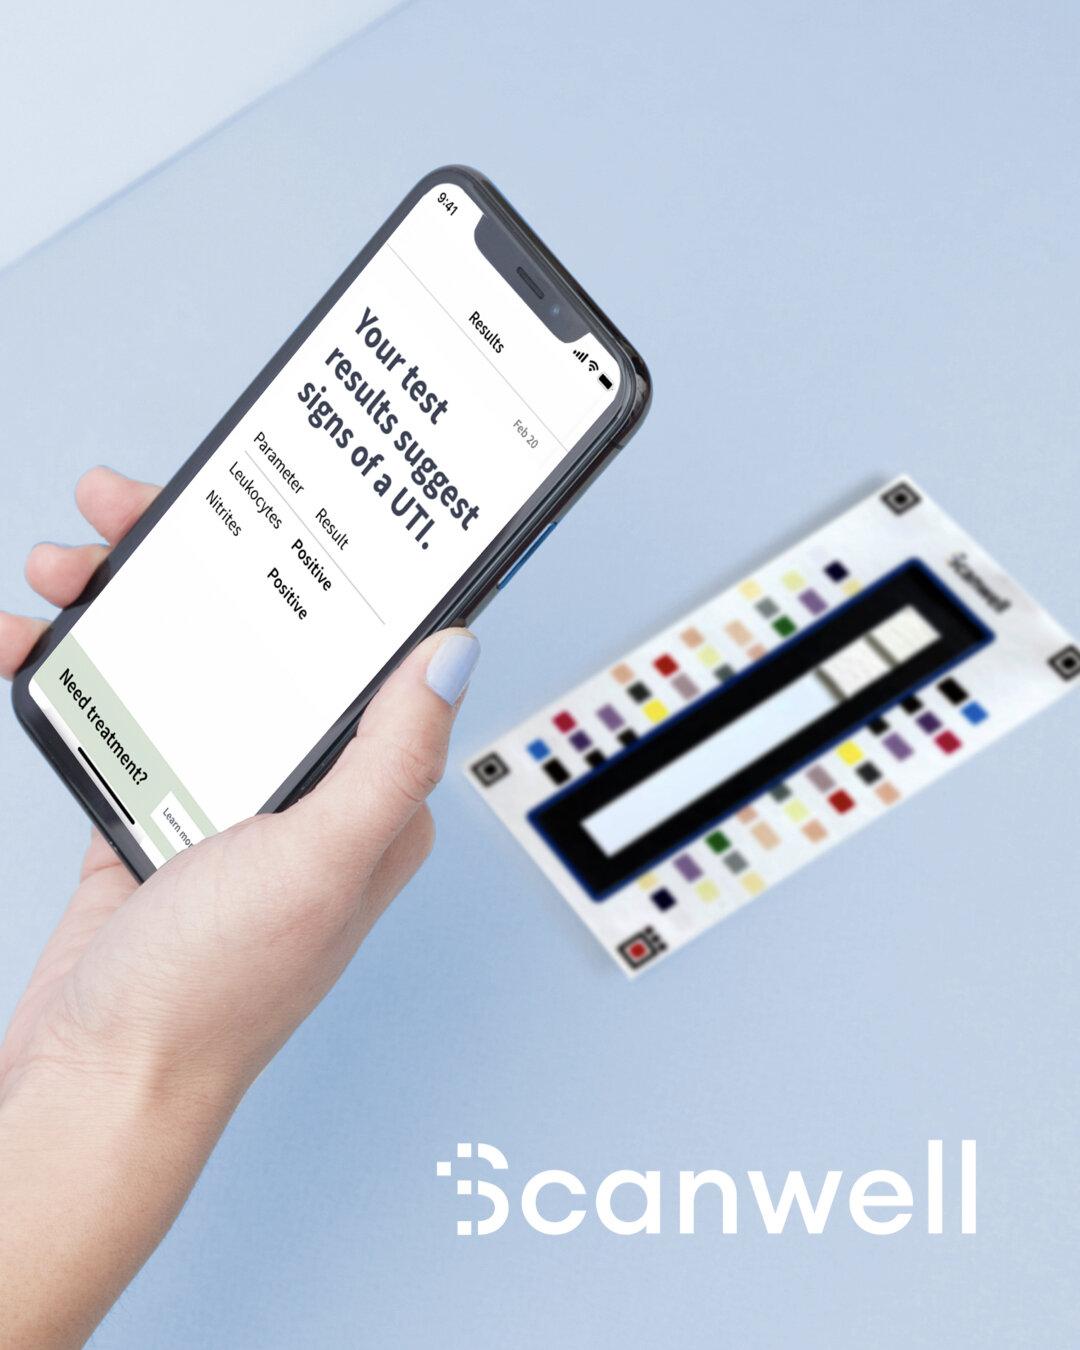 Scanwell_West 2019 - Headshots.001.jpeg